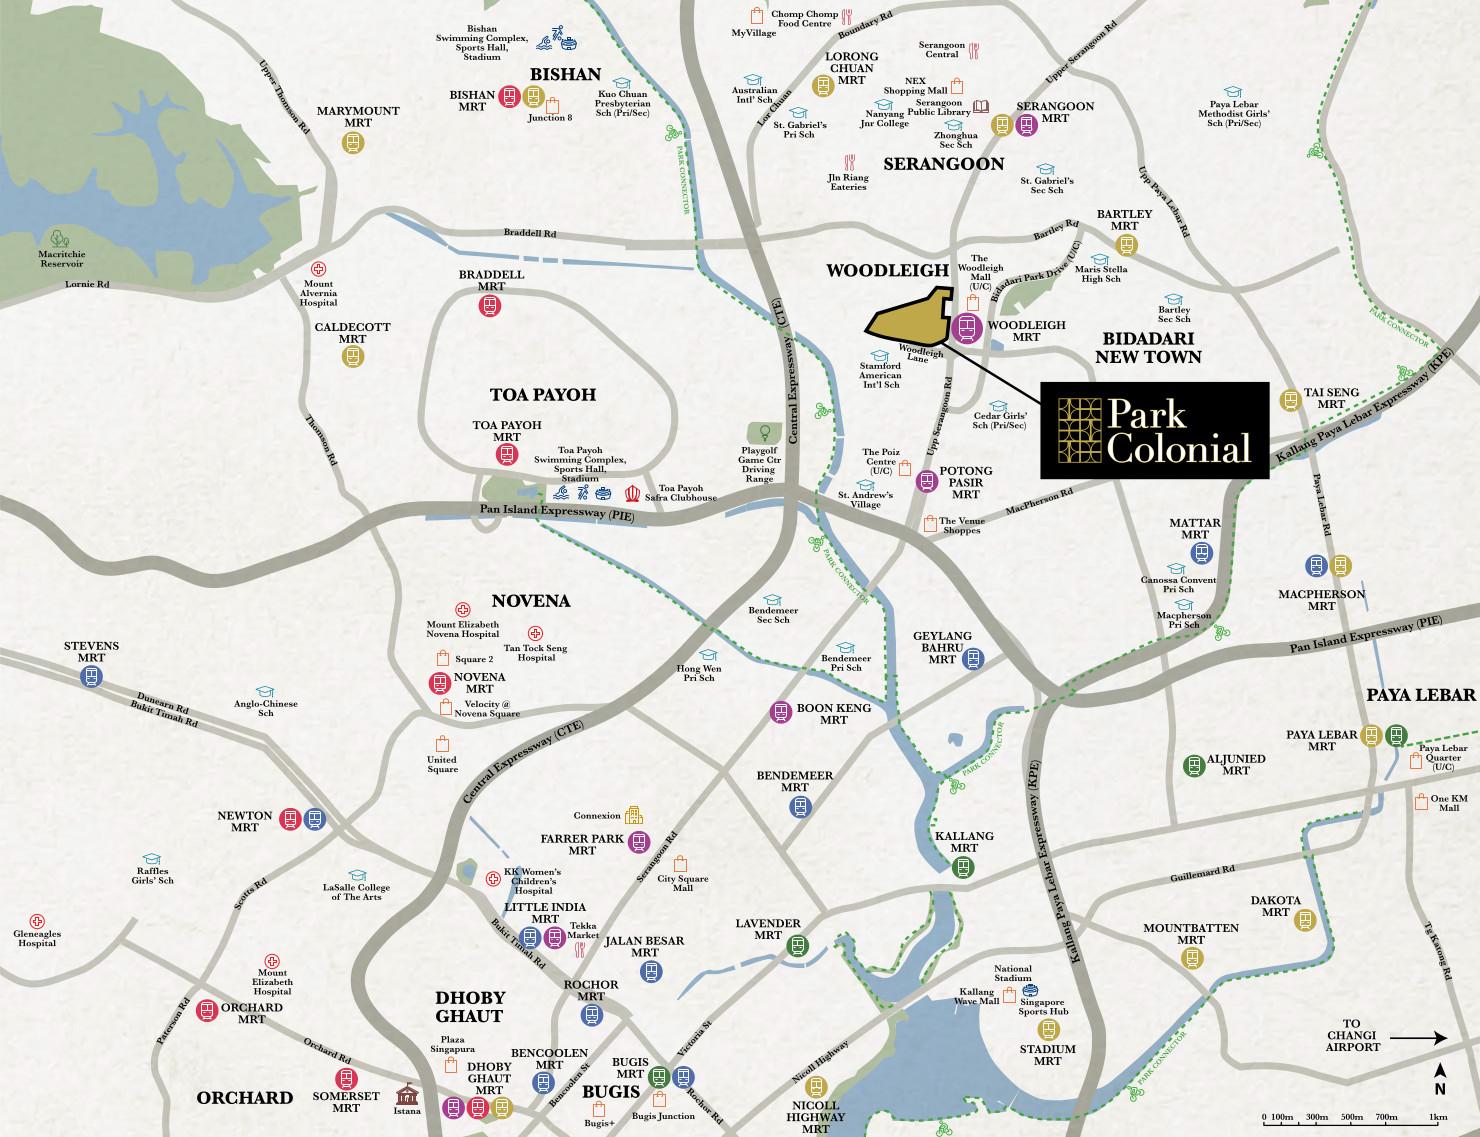 Parc Colonial Condo Location Map . Click to Enlarge